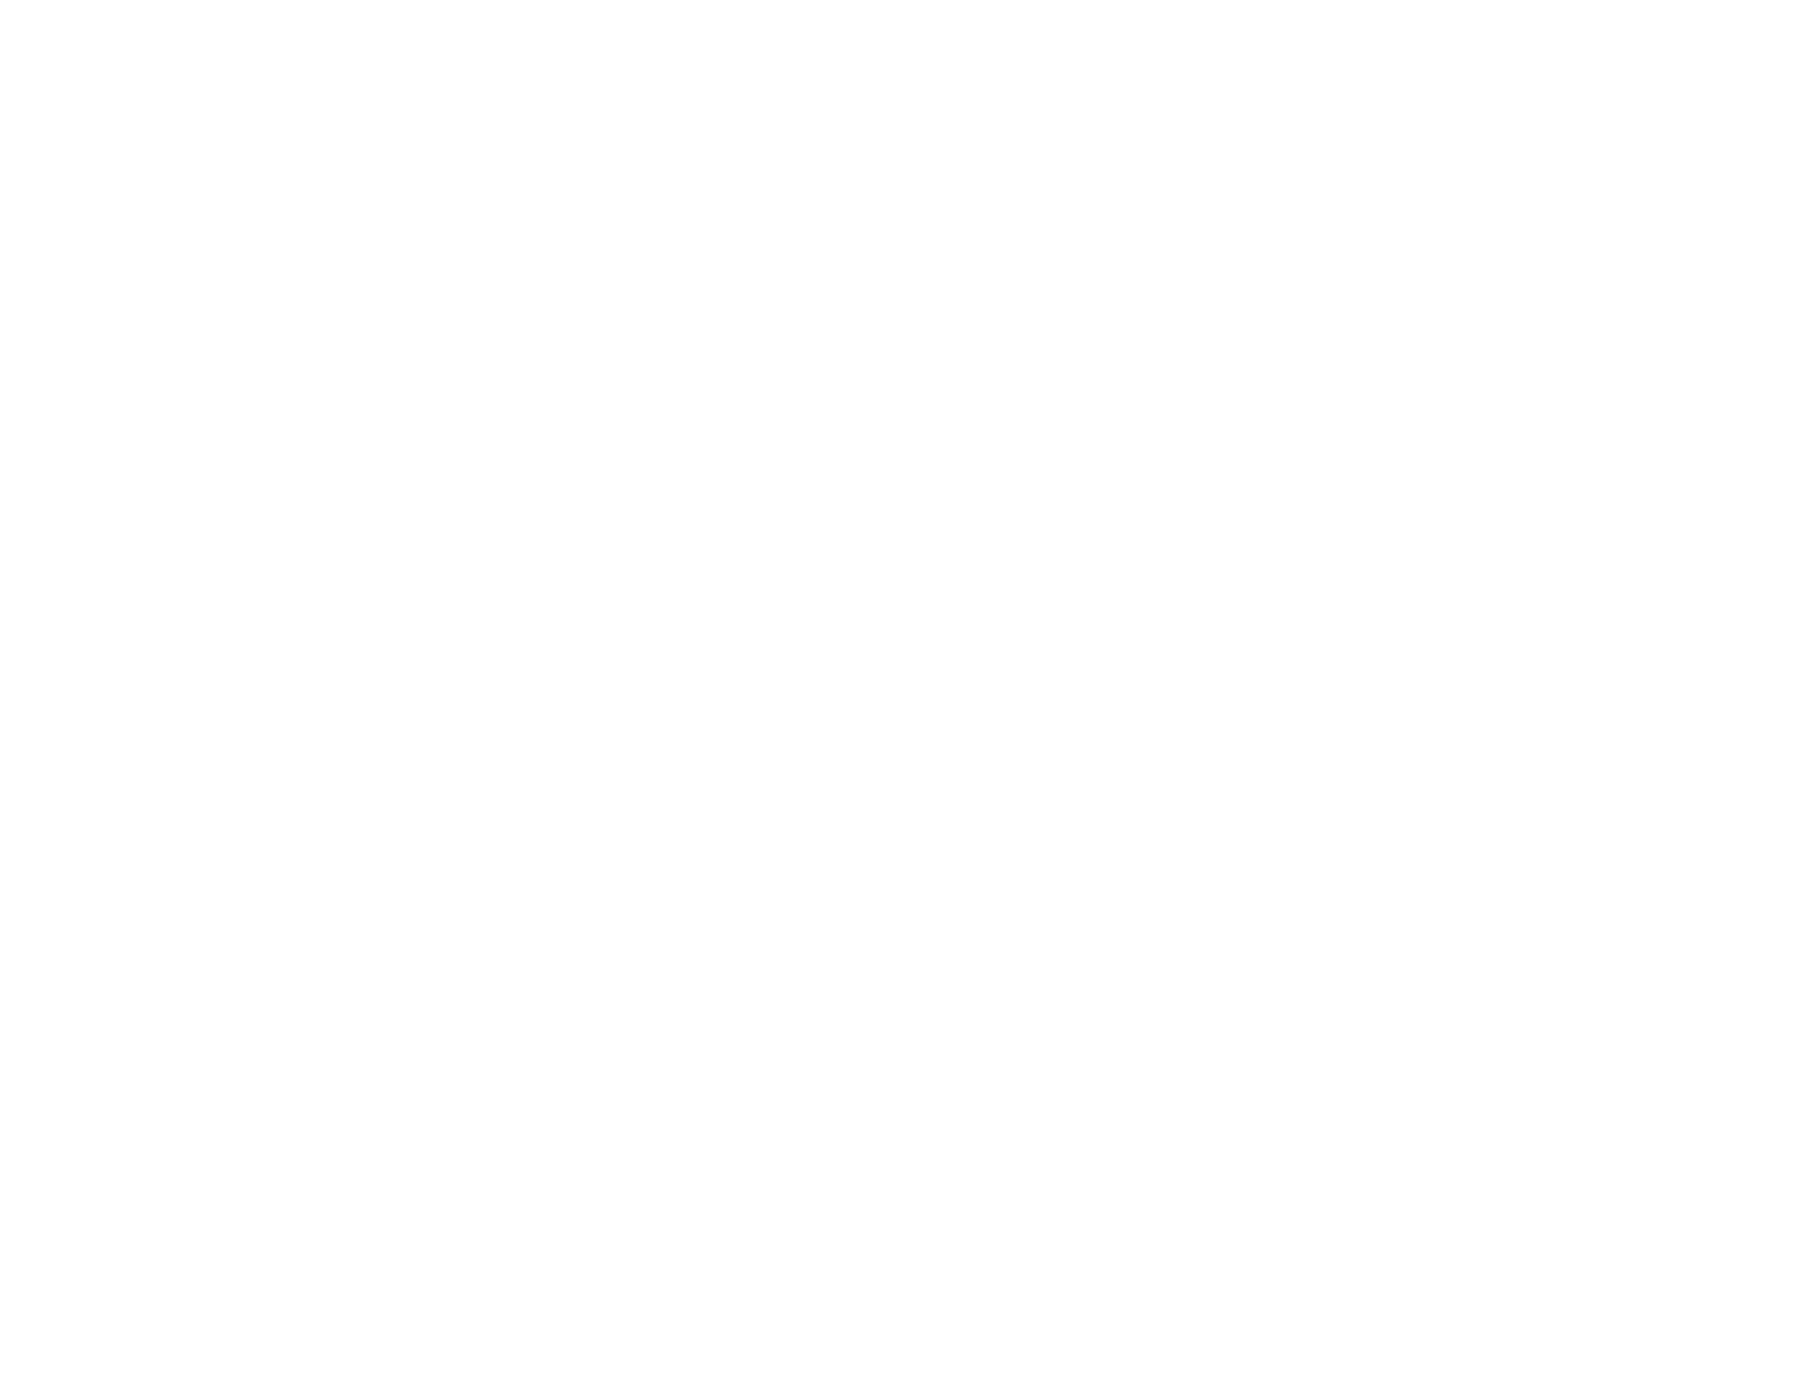 DSP-Logo-white-no-text (002)